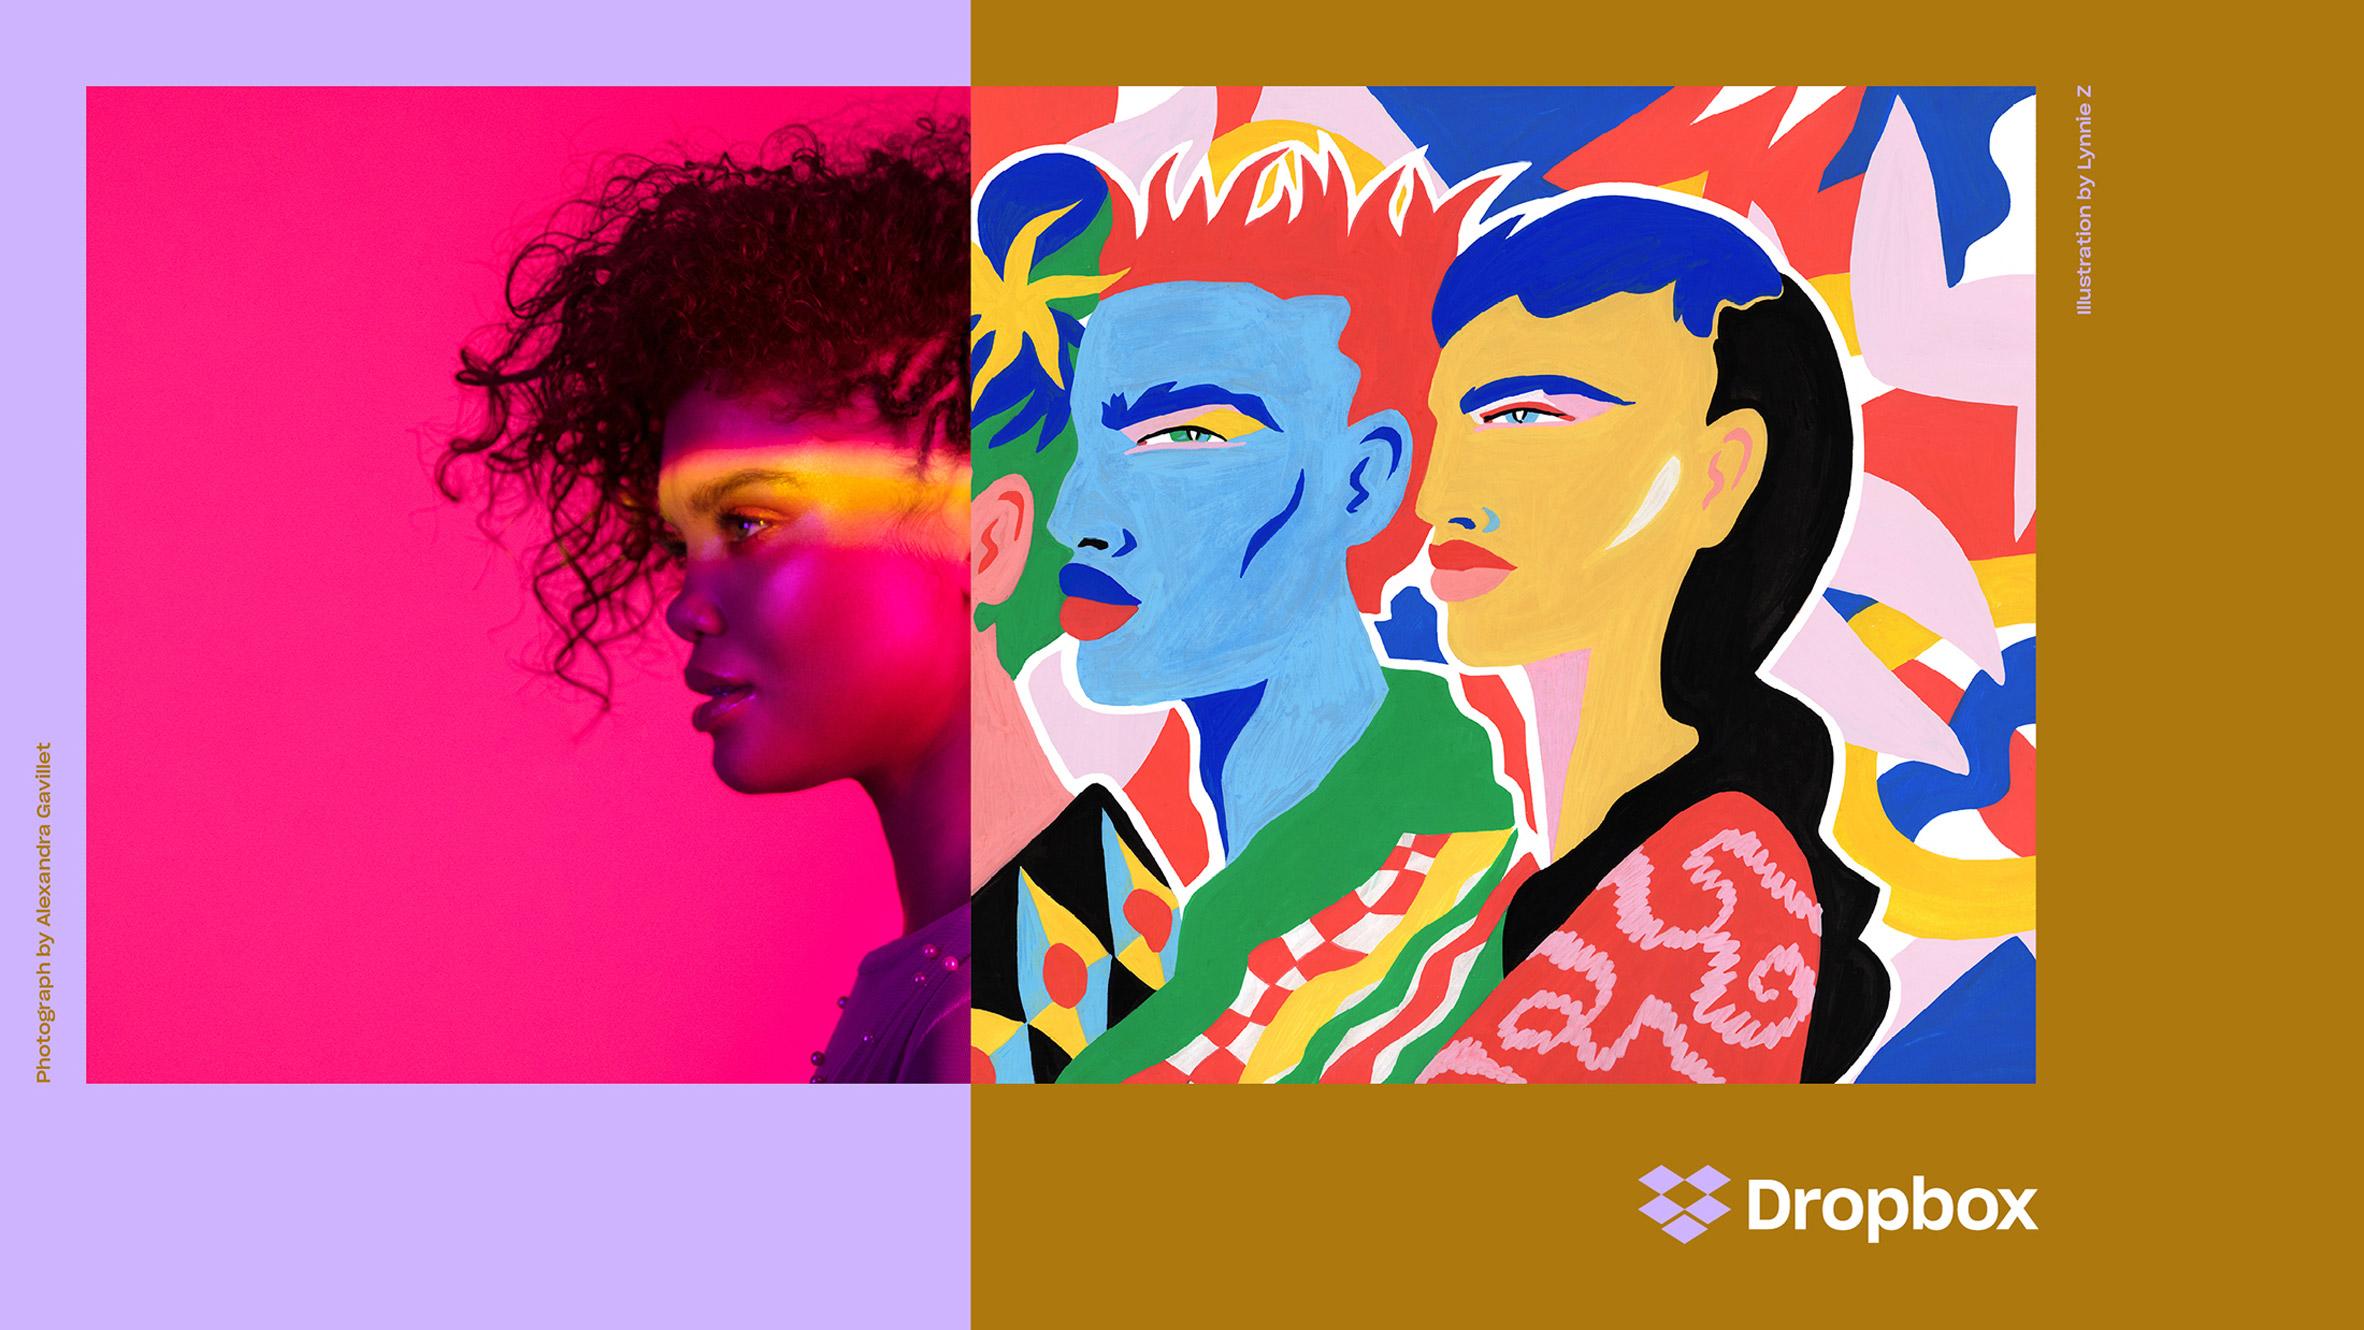 Dropbox Criticised For Colourful New Visual Identity